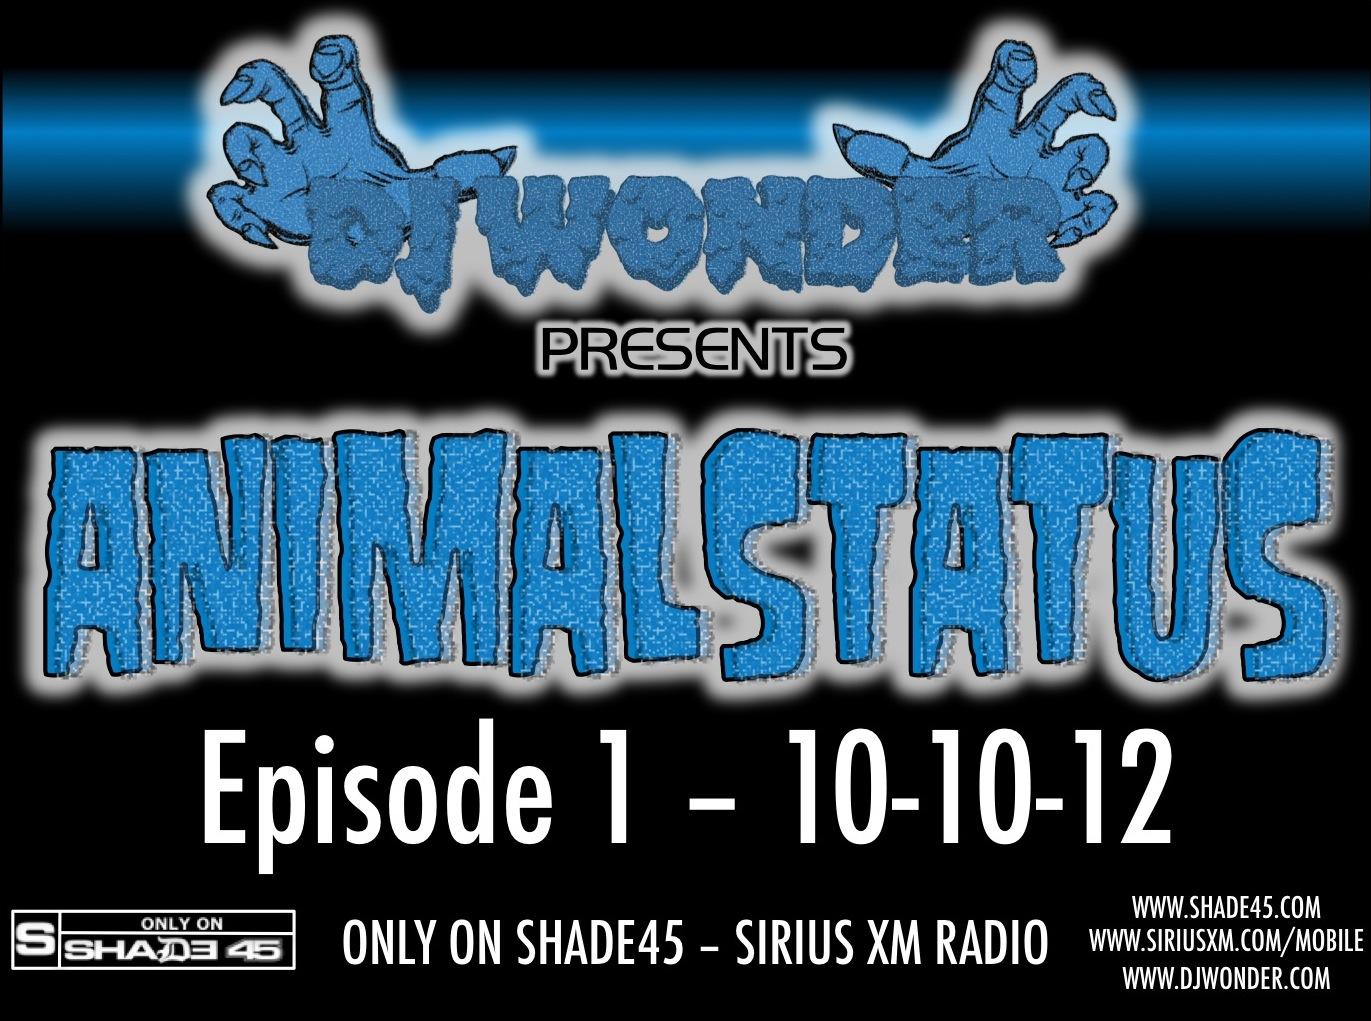 Dj wonder presents animalstatus ep1 10 10 2012 rockthedub for Kendrick lamar swimming pools mp3 download free